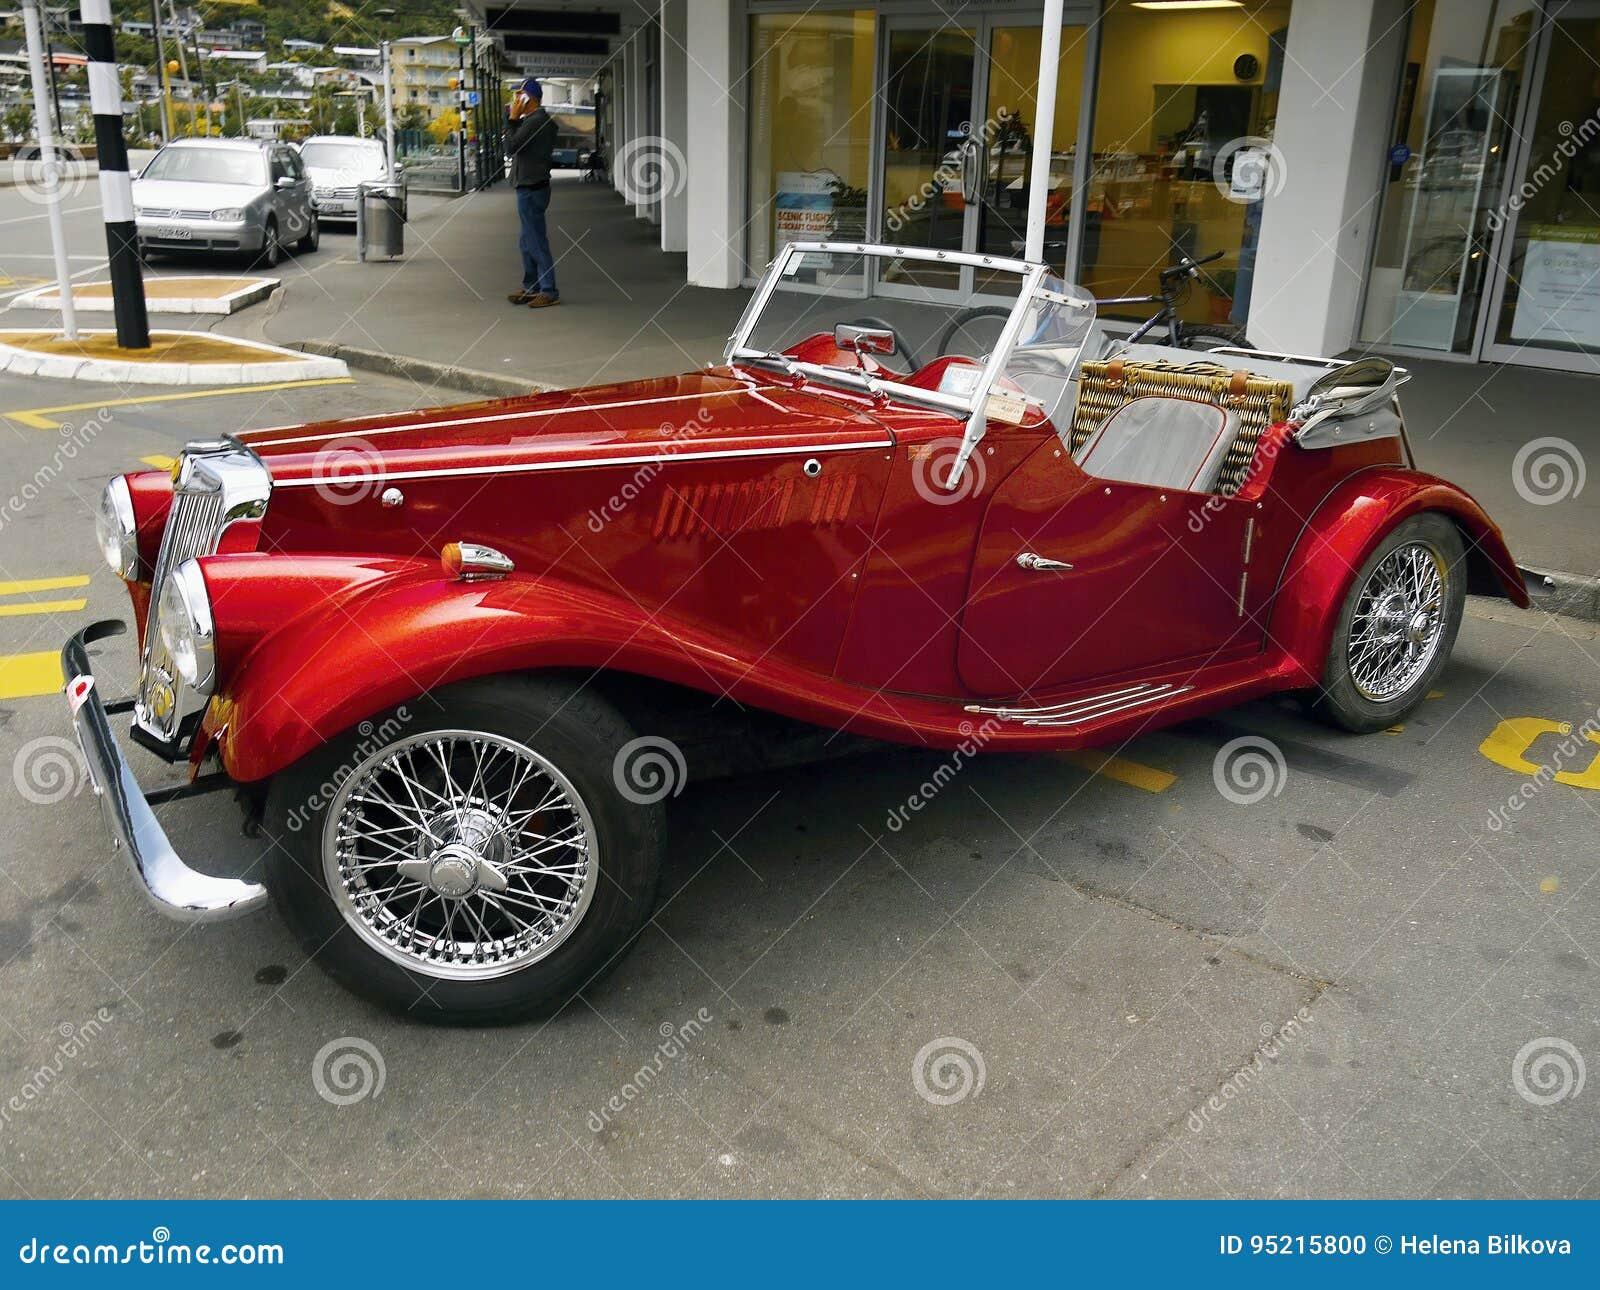 mg vintage cars sports cars editorial image image of retro cars 95215800. Black Bedroom Furniture Sets. Home Design Ideas